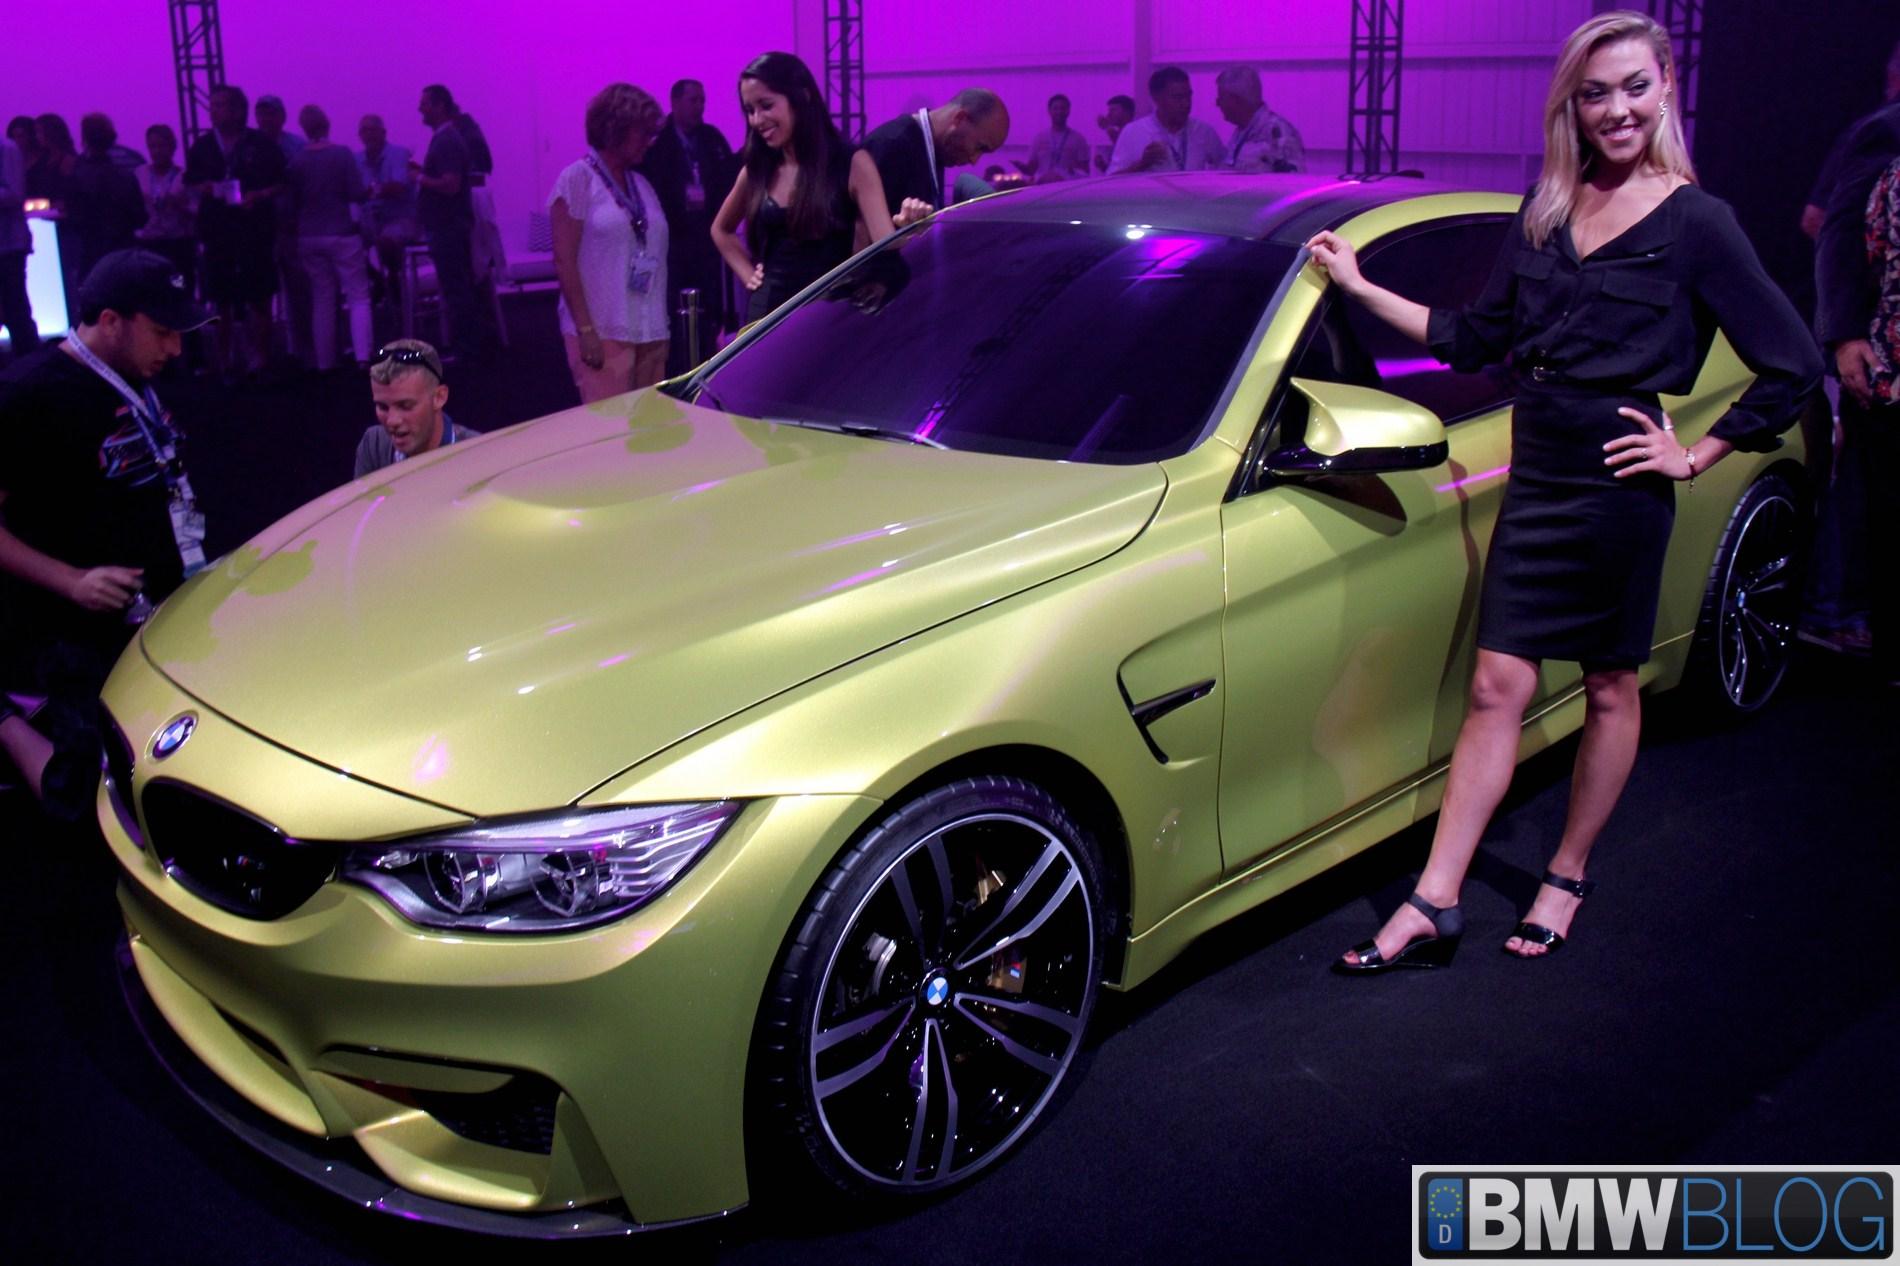 BMW Concept M4 Coupe unveiled at Oktoberfest BMWCCA